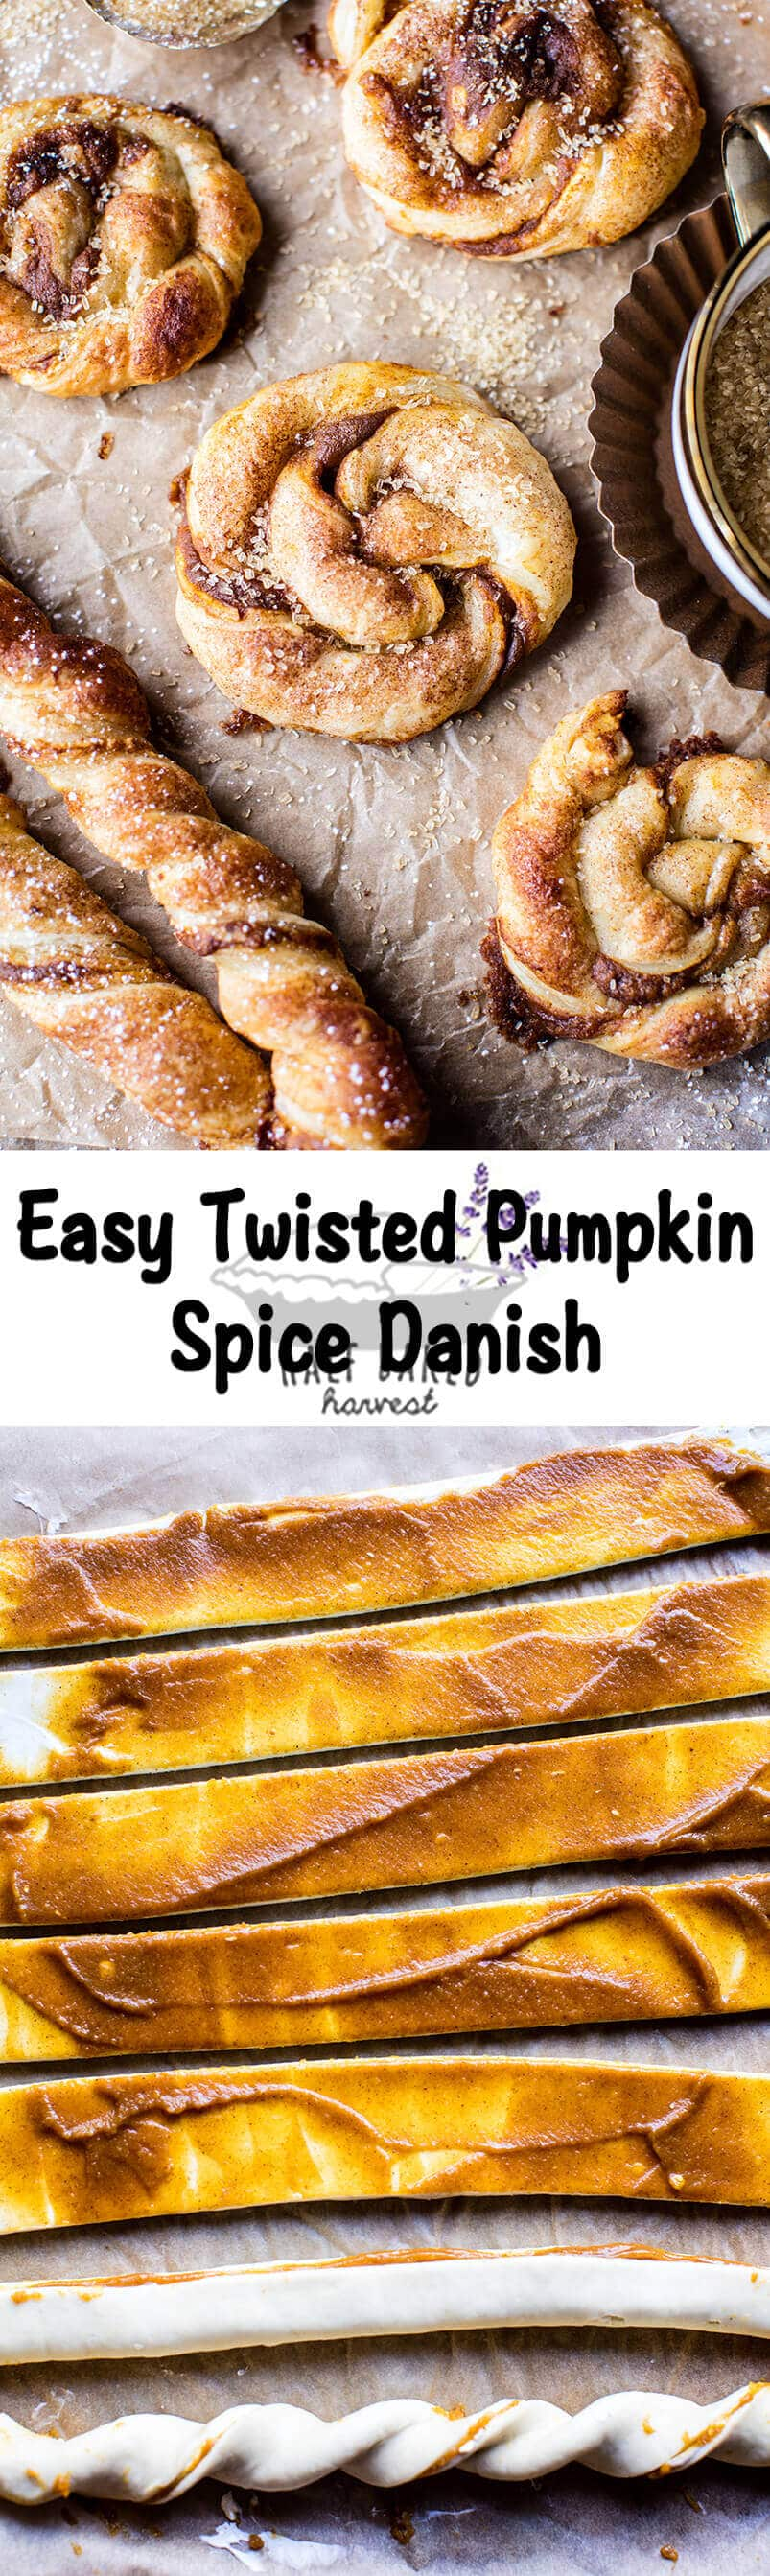 Easy Twisted Pumpkin Spice Danish | halfbakedharvest.com @hbharvest